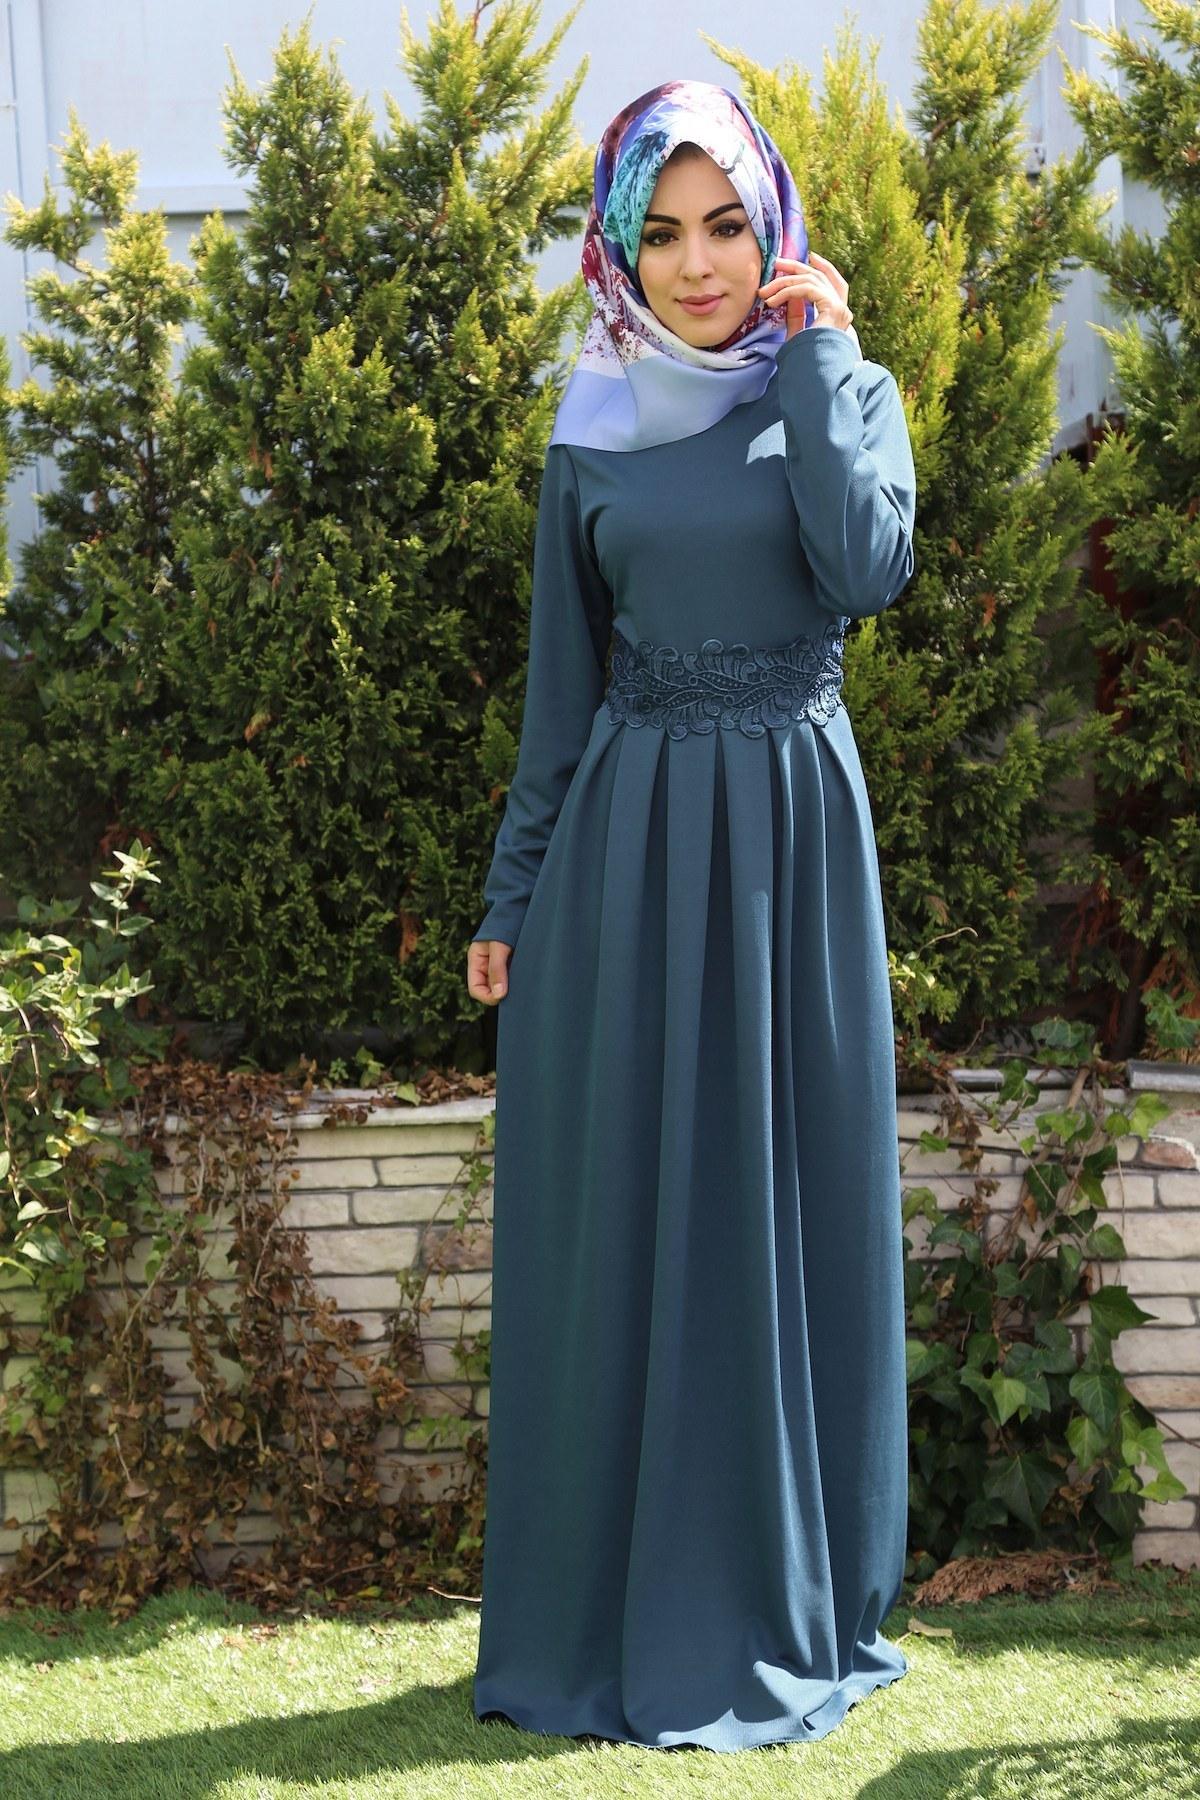 eac6dddf14ff6 Tesettür Giyim, Tesettür Elbise, Ferace | Modasena.com